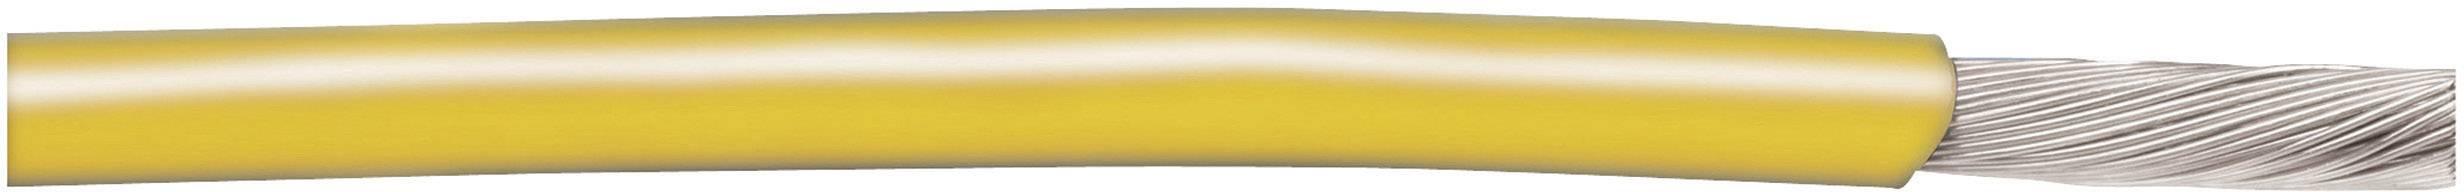 Pletenica 1 x 0.32 mm, rumena AlphaWire 3051 YL001 cena za meter